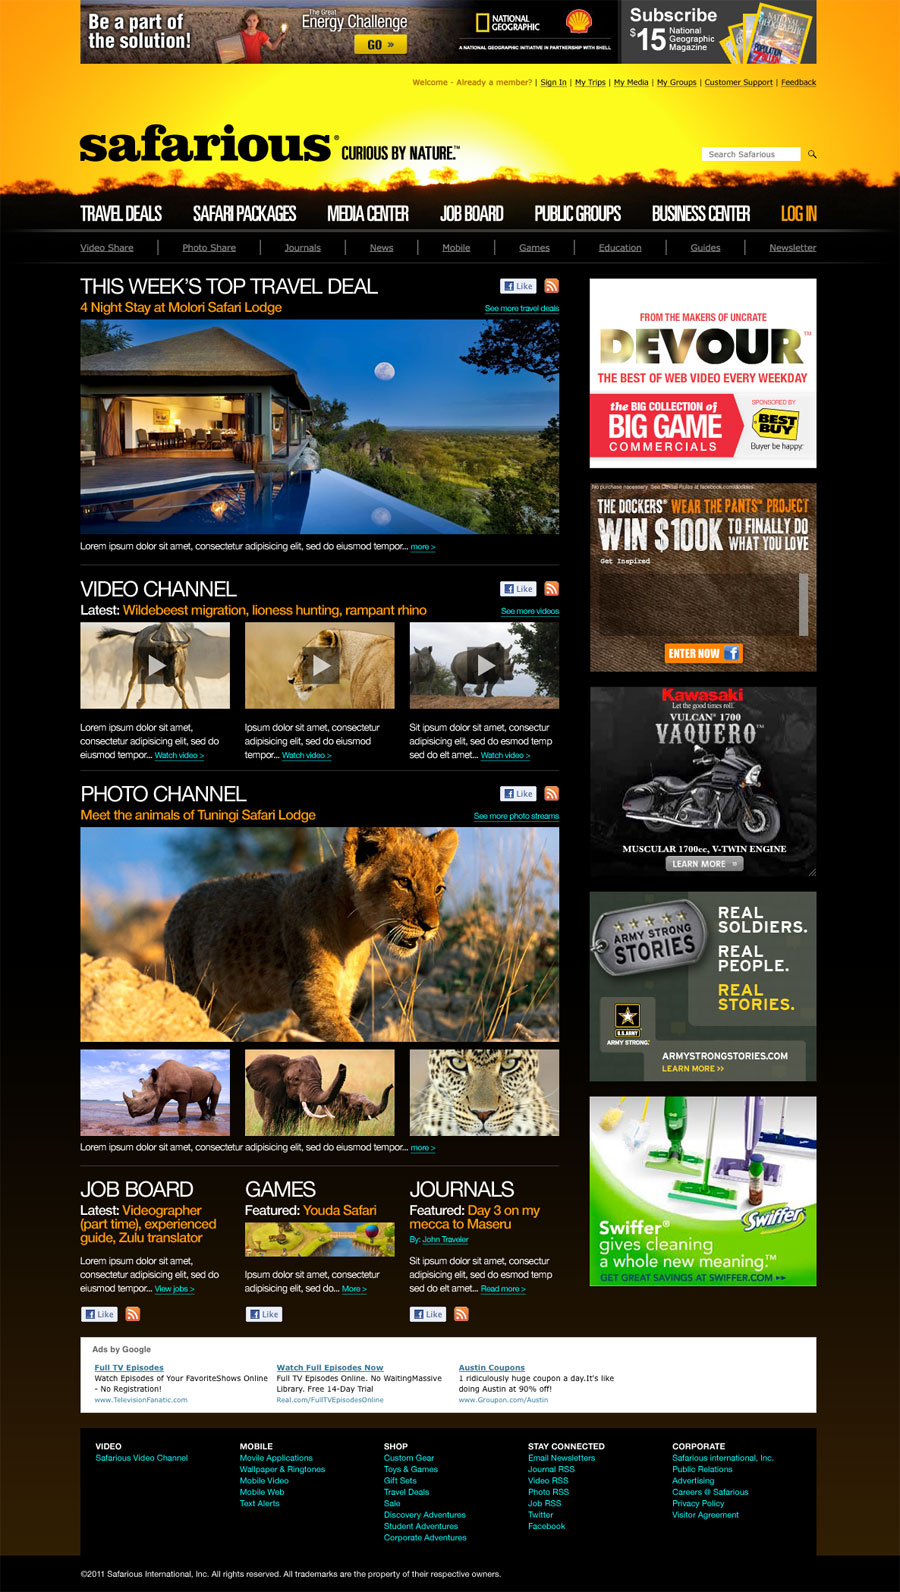 Web_Safarious_Large